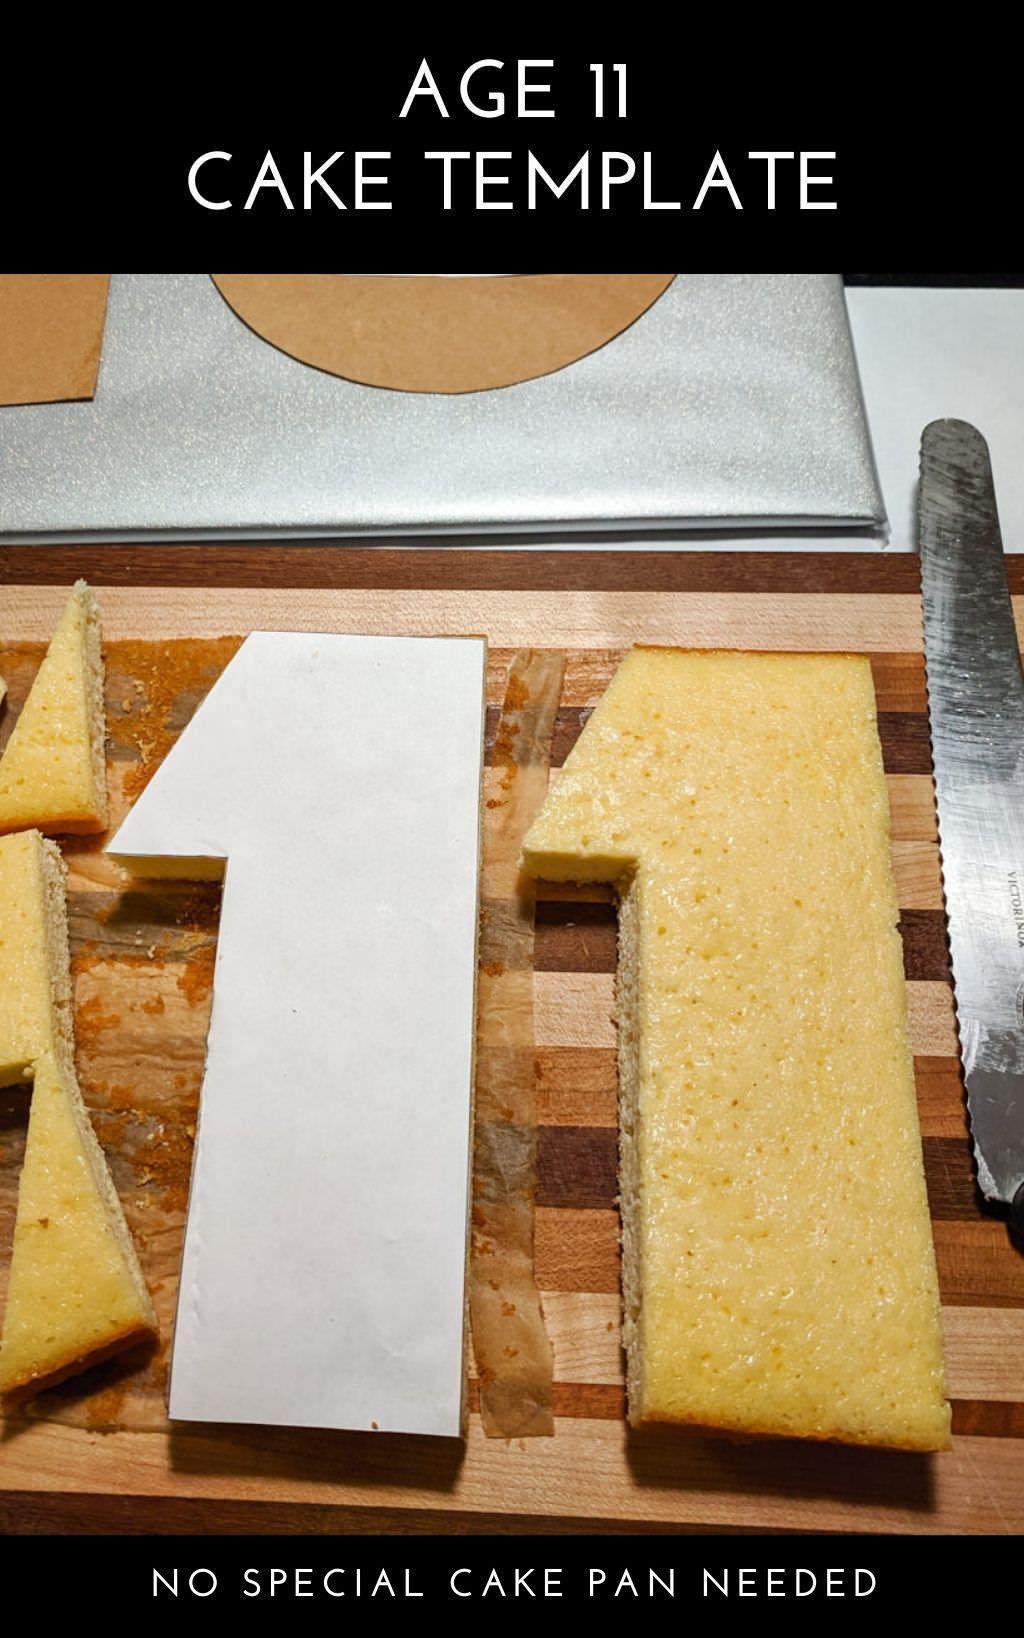 Ice Skating Cake With Ice Skate Topper Template Number Birthday Cakes Number 1 Cake 10 Birthday Cake